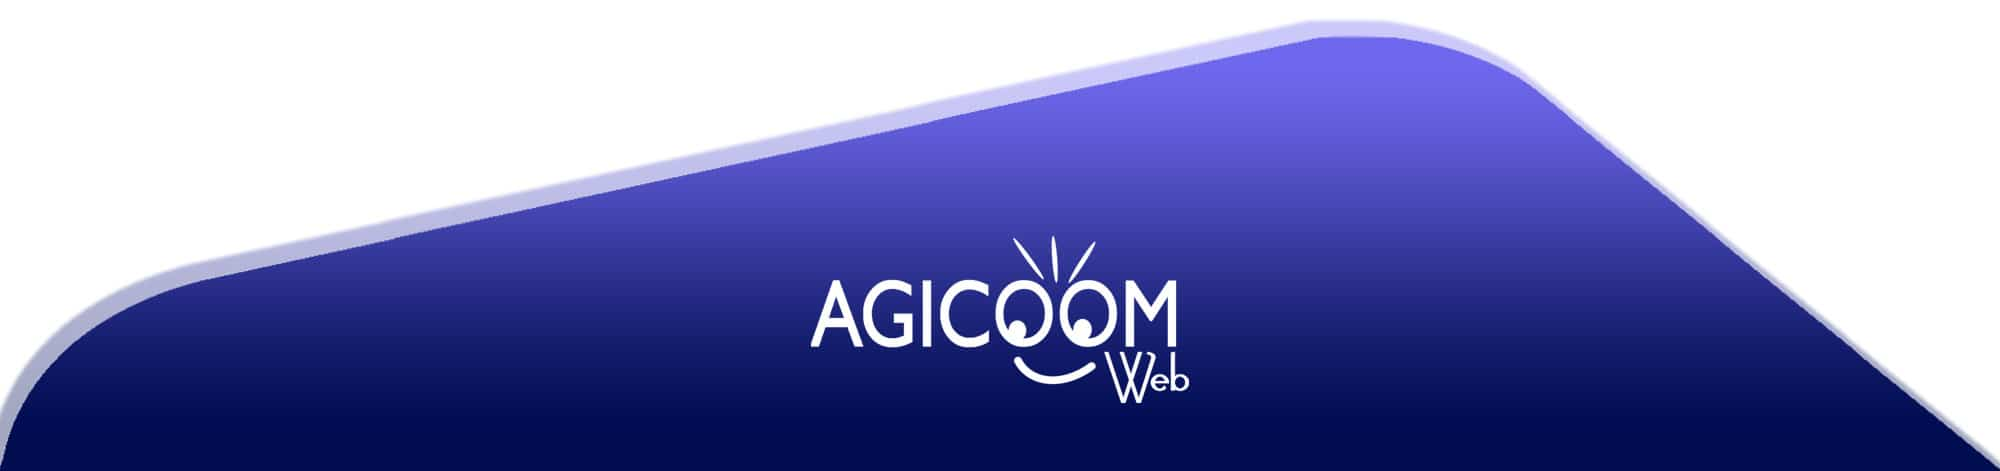 agicoom web sito sicuro gdpr footer